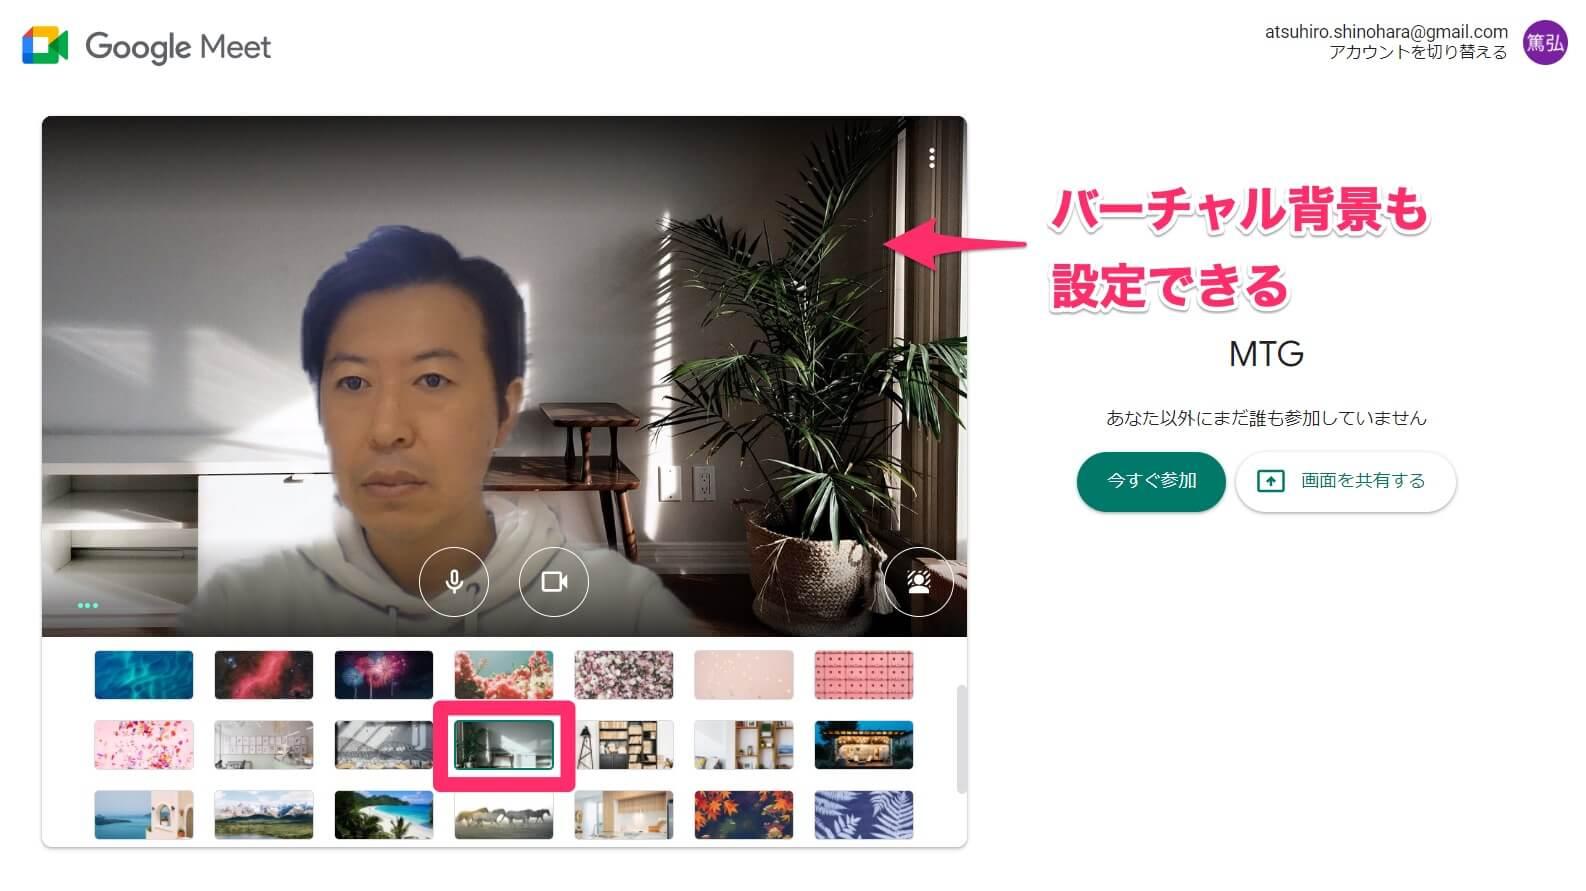 Google Meetで背景のぼかしやバーチャル背景を設定する方法